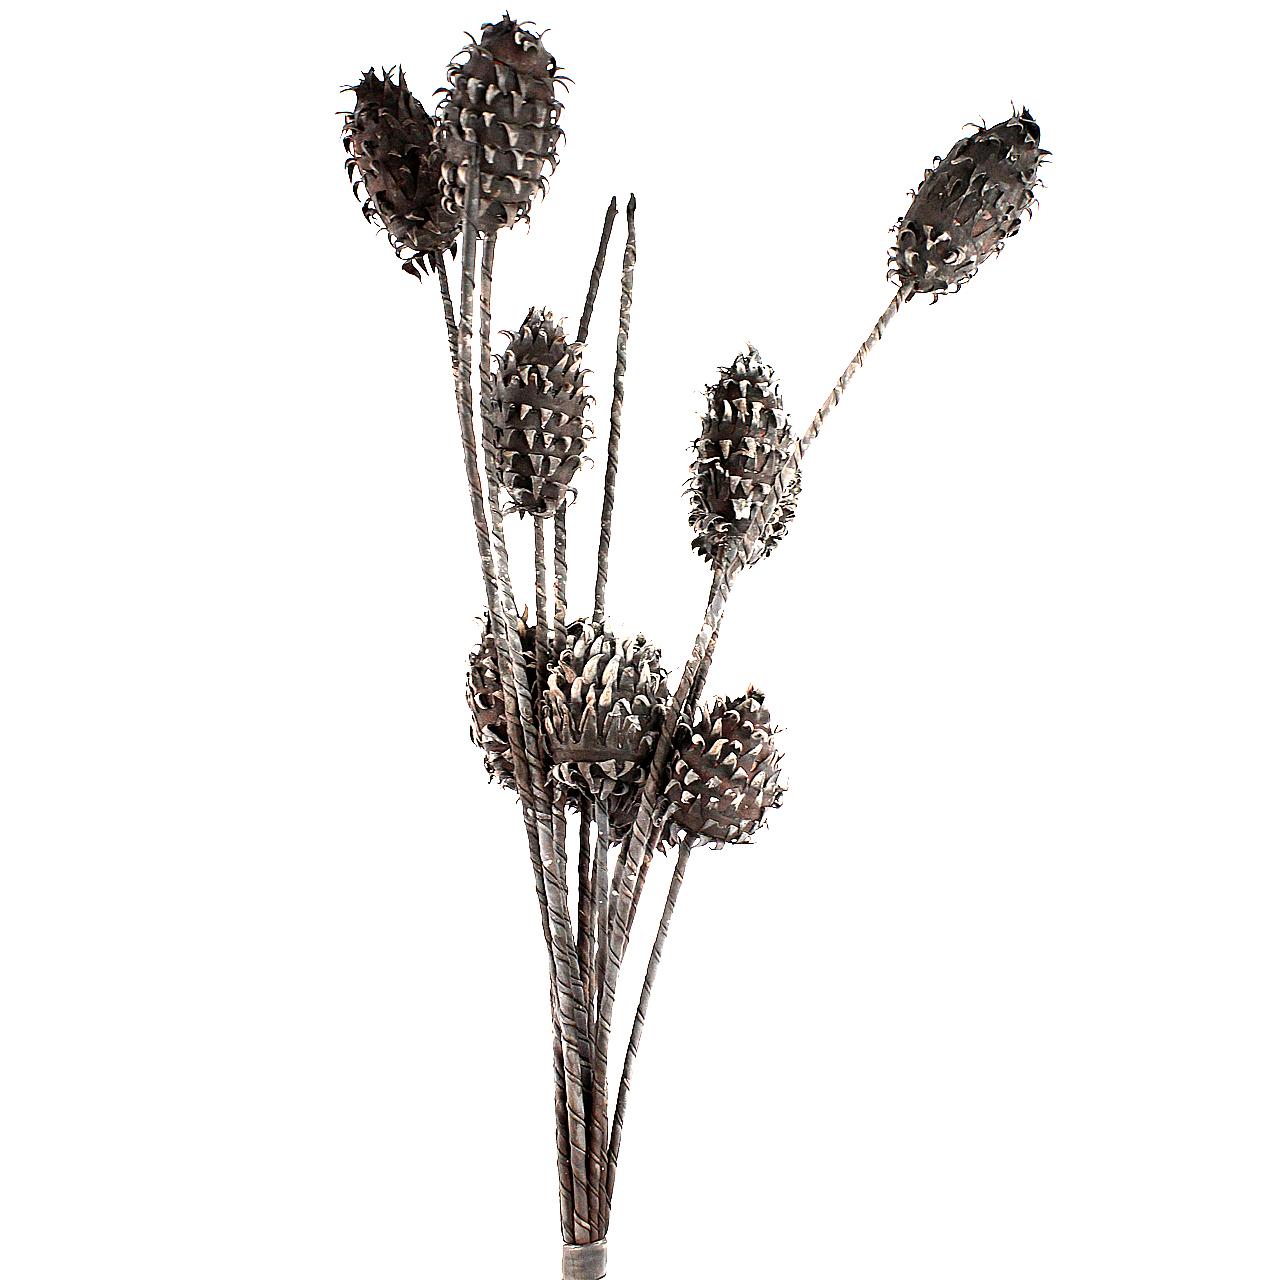 Floare decorativa Scai maro 140 cm( 391532)